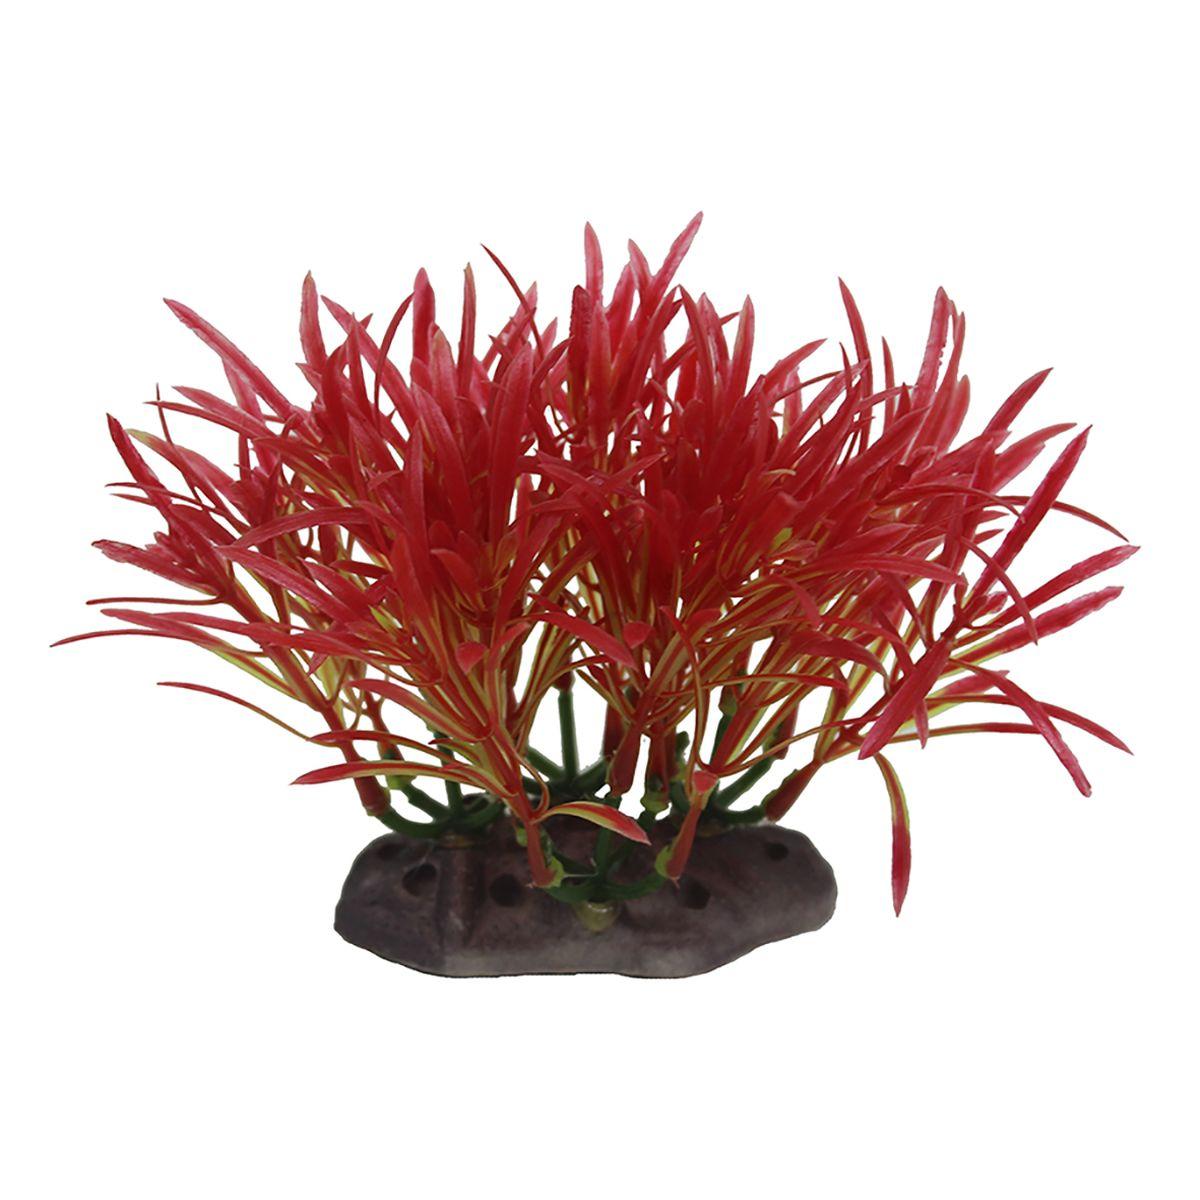 Растение для аквариума ArtUniq Аммания изящная, высота 10-12 смART-1192123Растение для аквариума ArtUniq Аммания изящная, высота 10-12 см